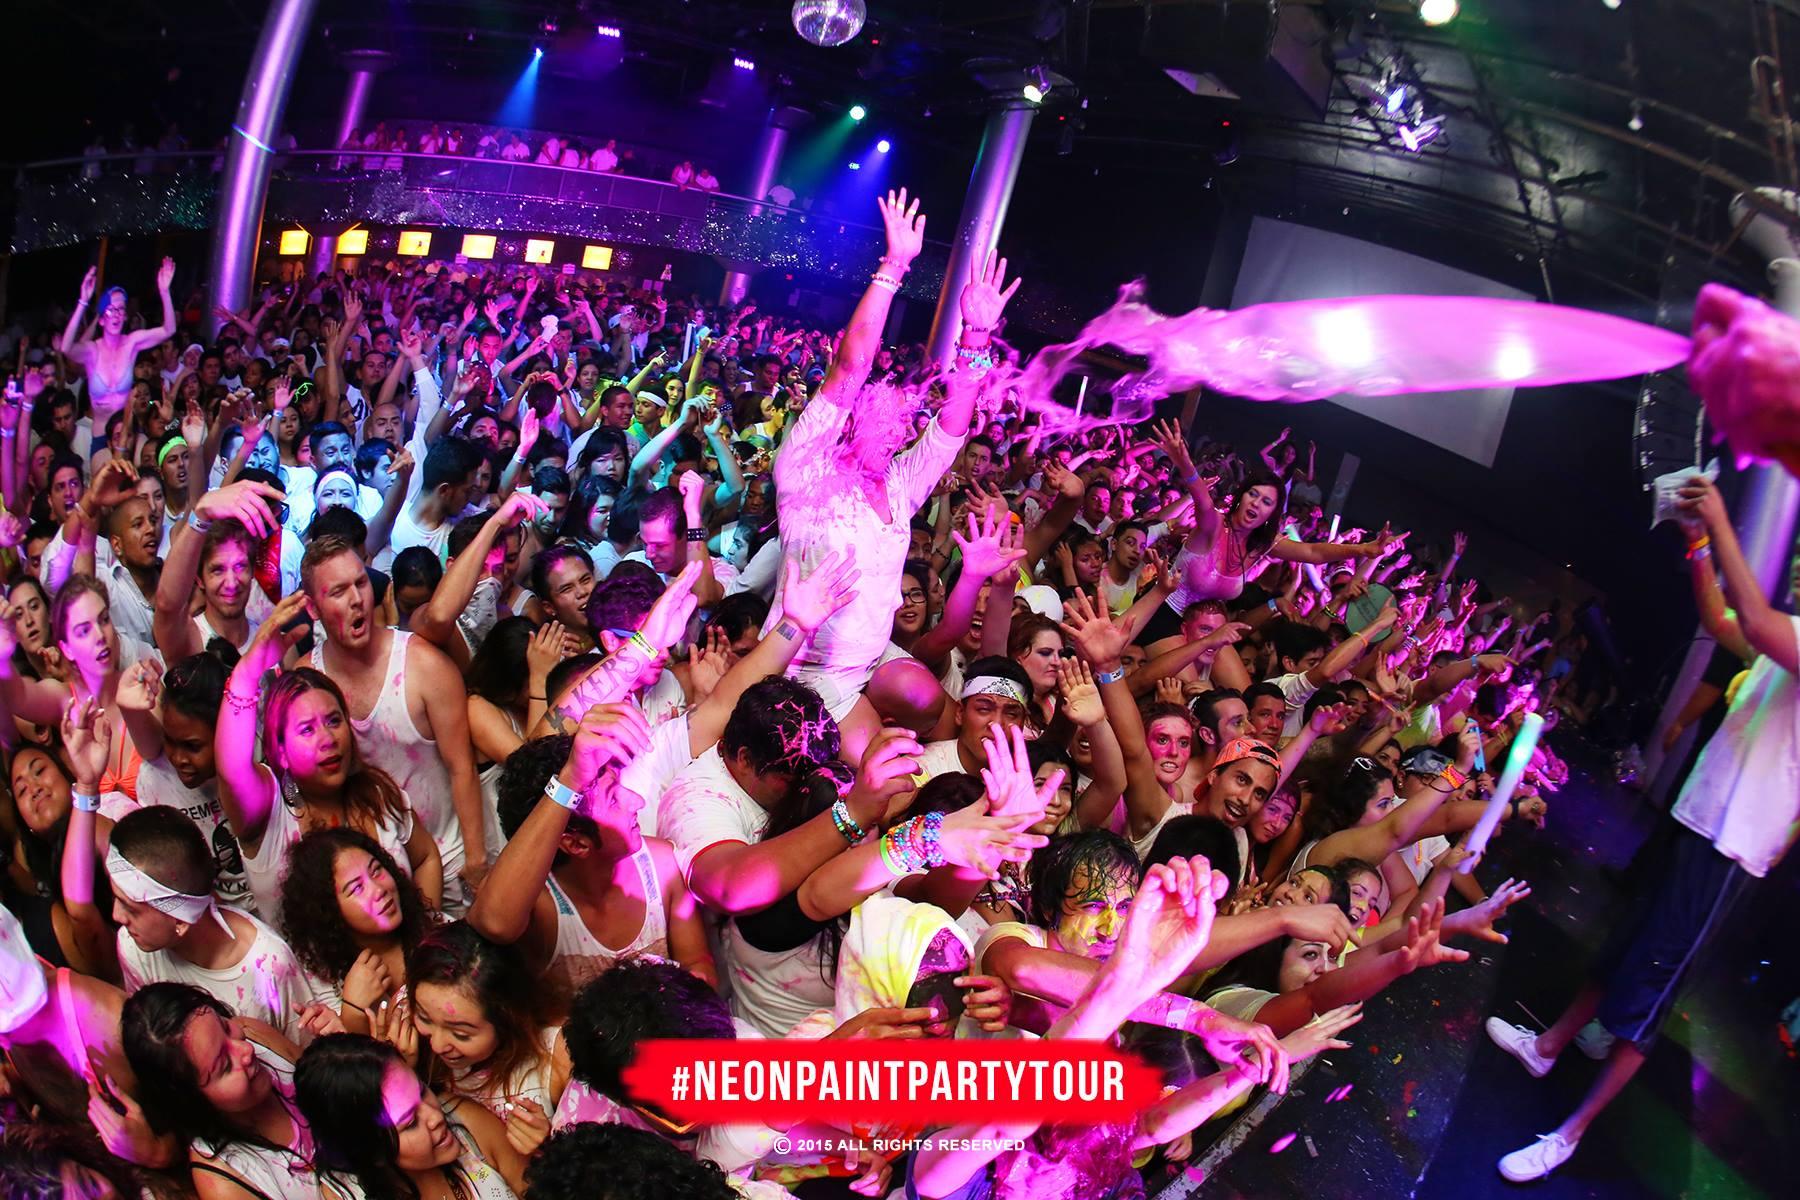 The Neon Paint Party Tour: Halloween Paint Bath 18+ Tickets 10/17/15